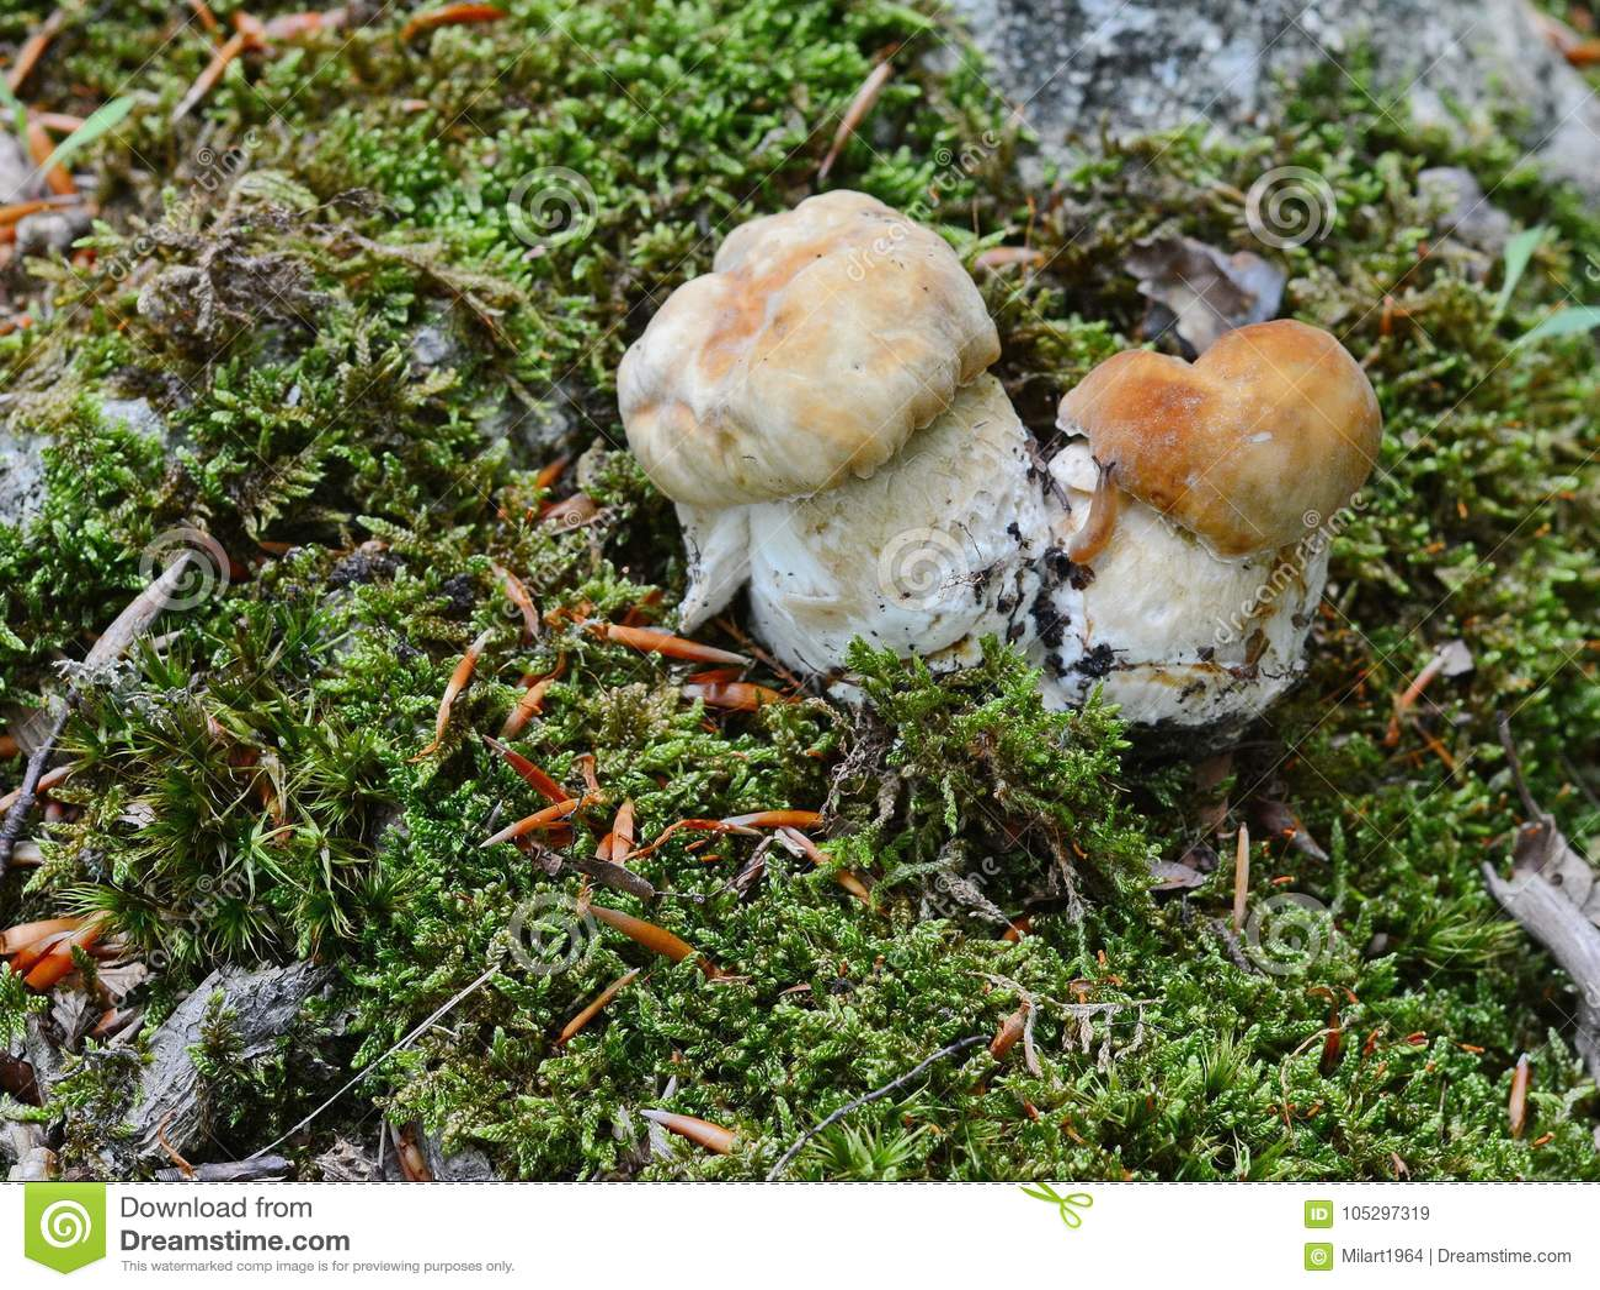 Forest boletus mushrooms on the ground.